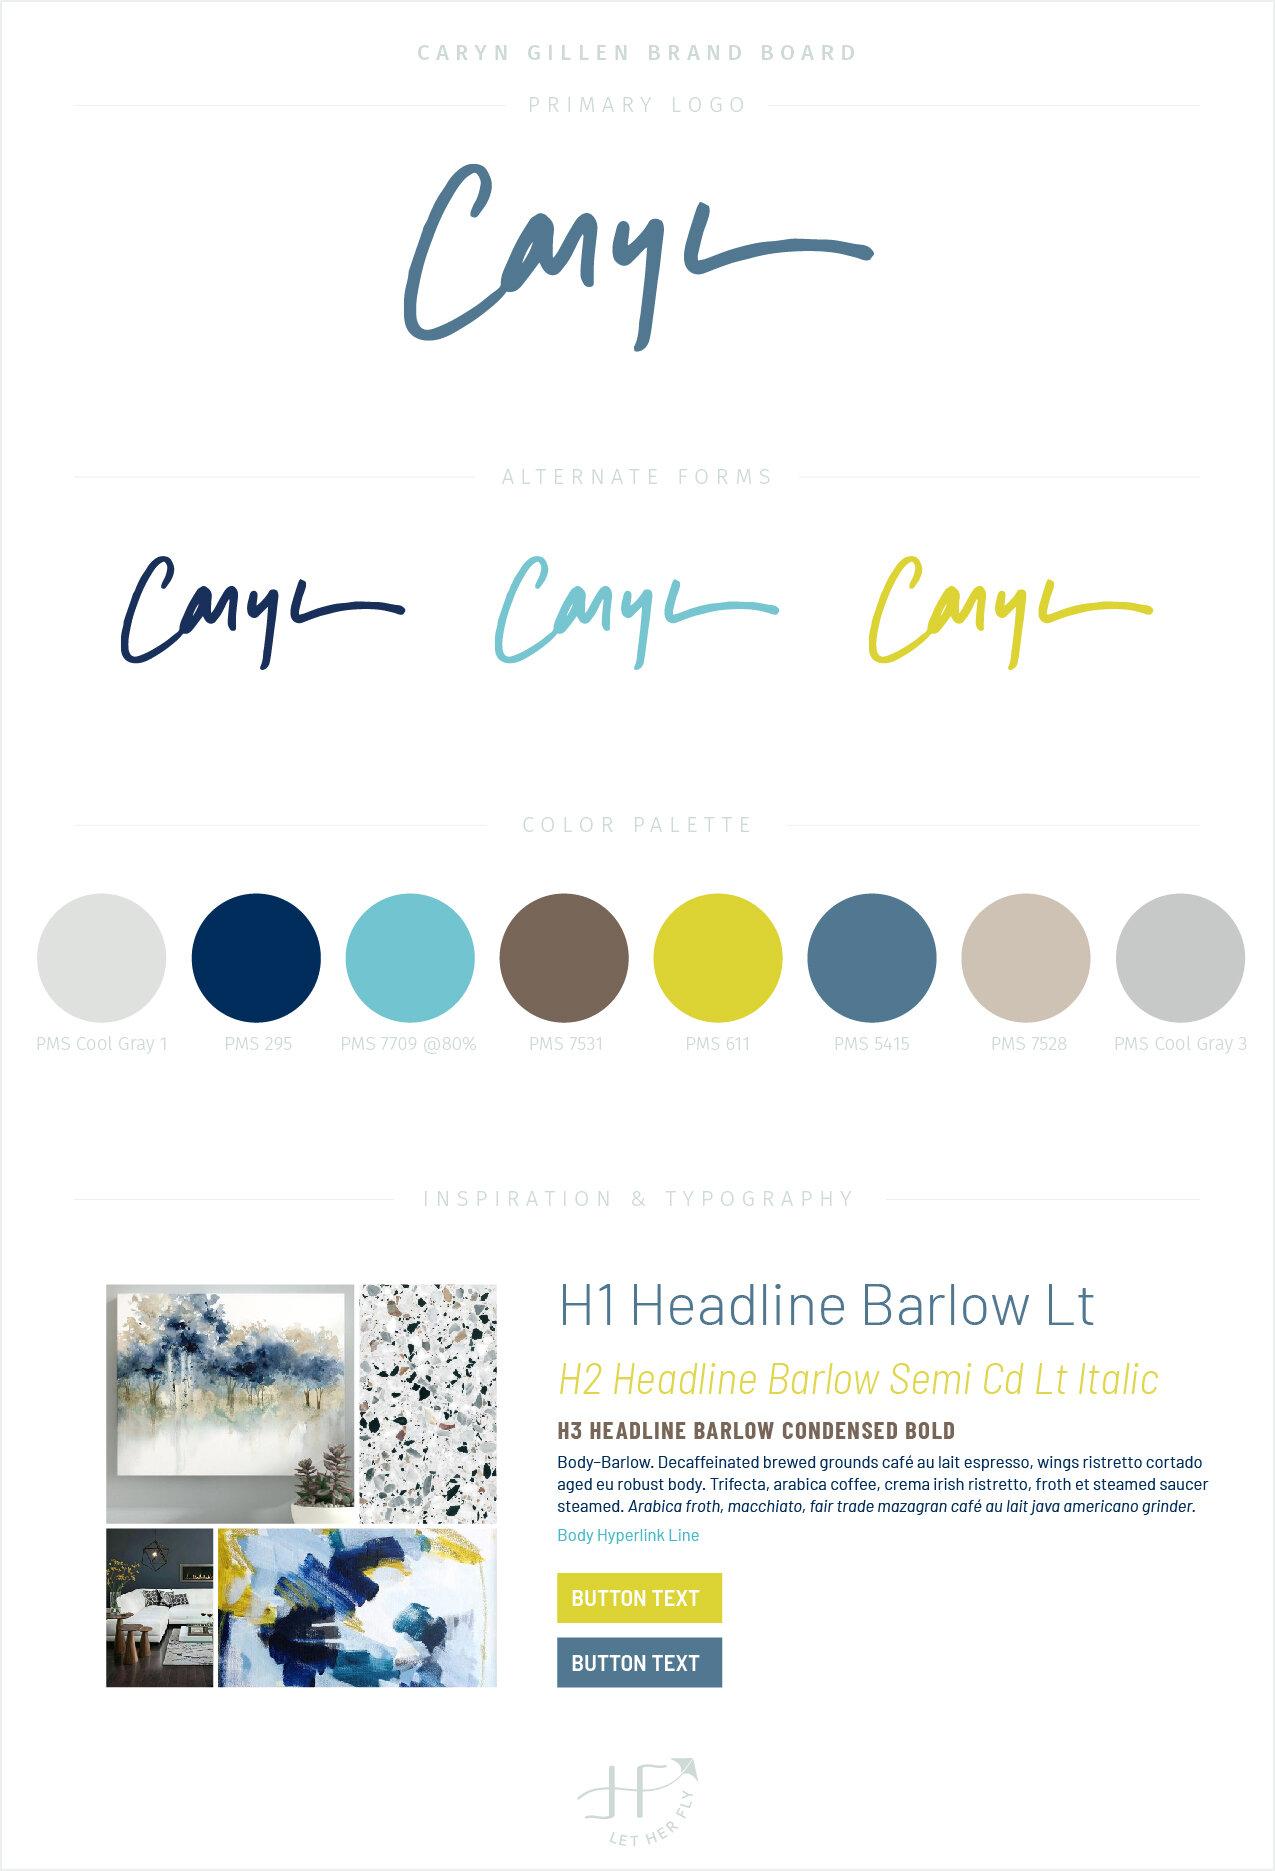 Caryn Gillen final brand board by Michelle Clayton | Let Her Fly